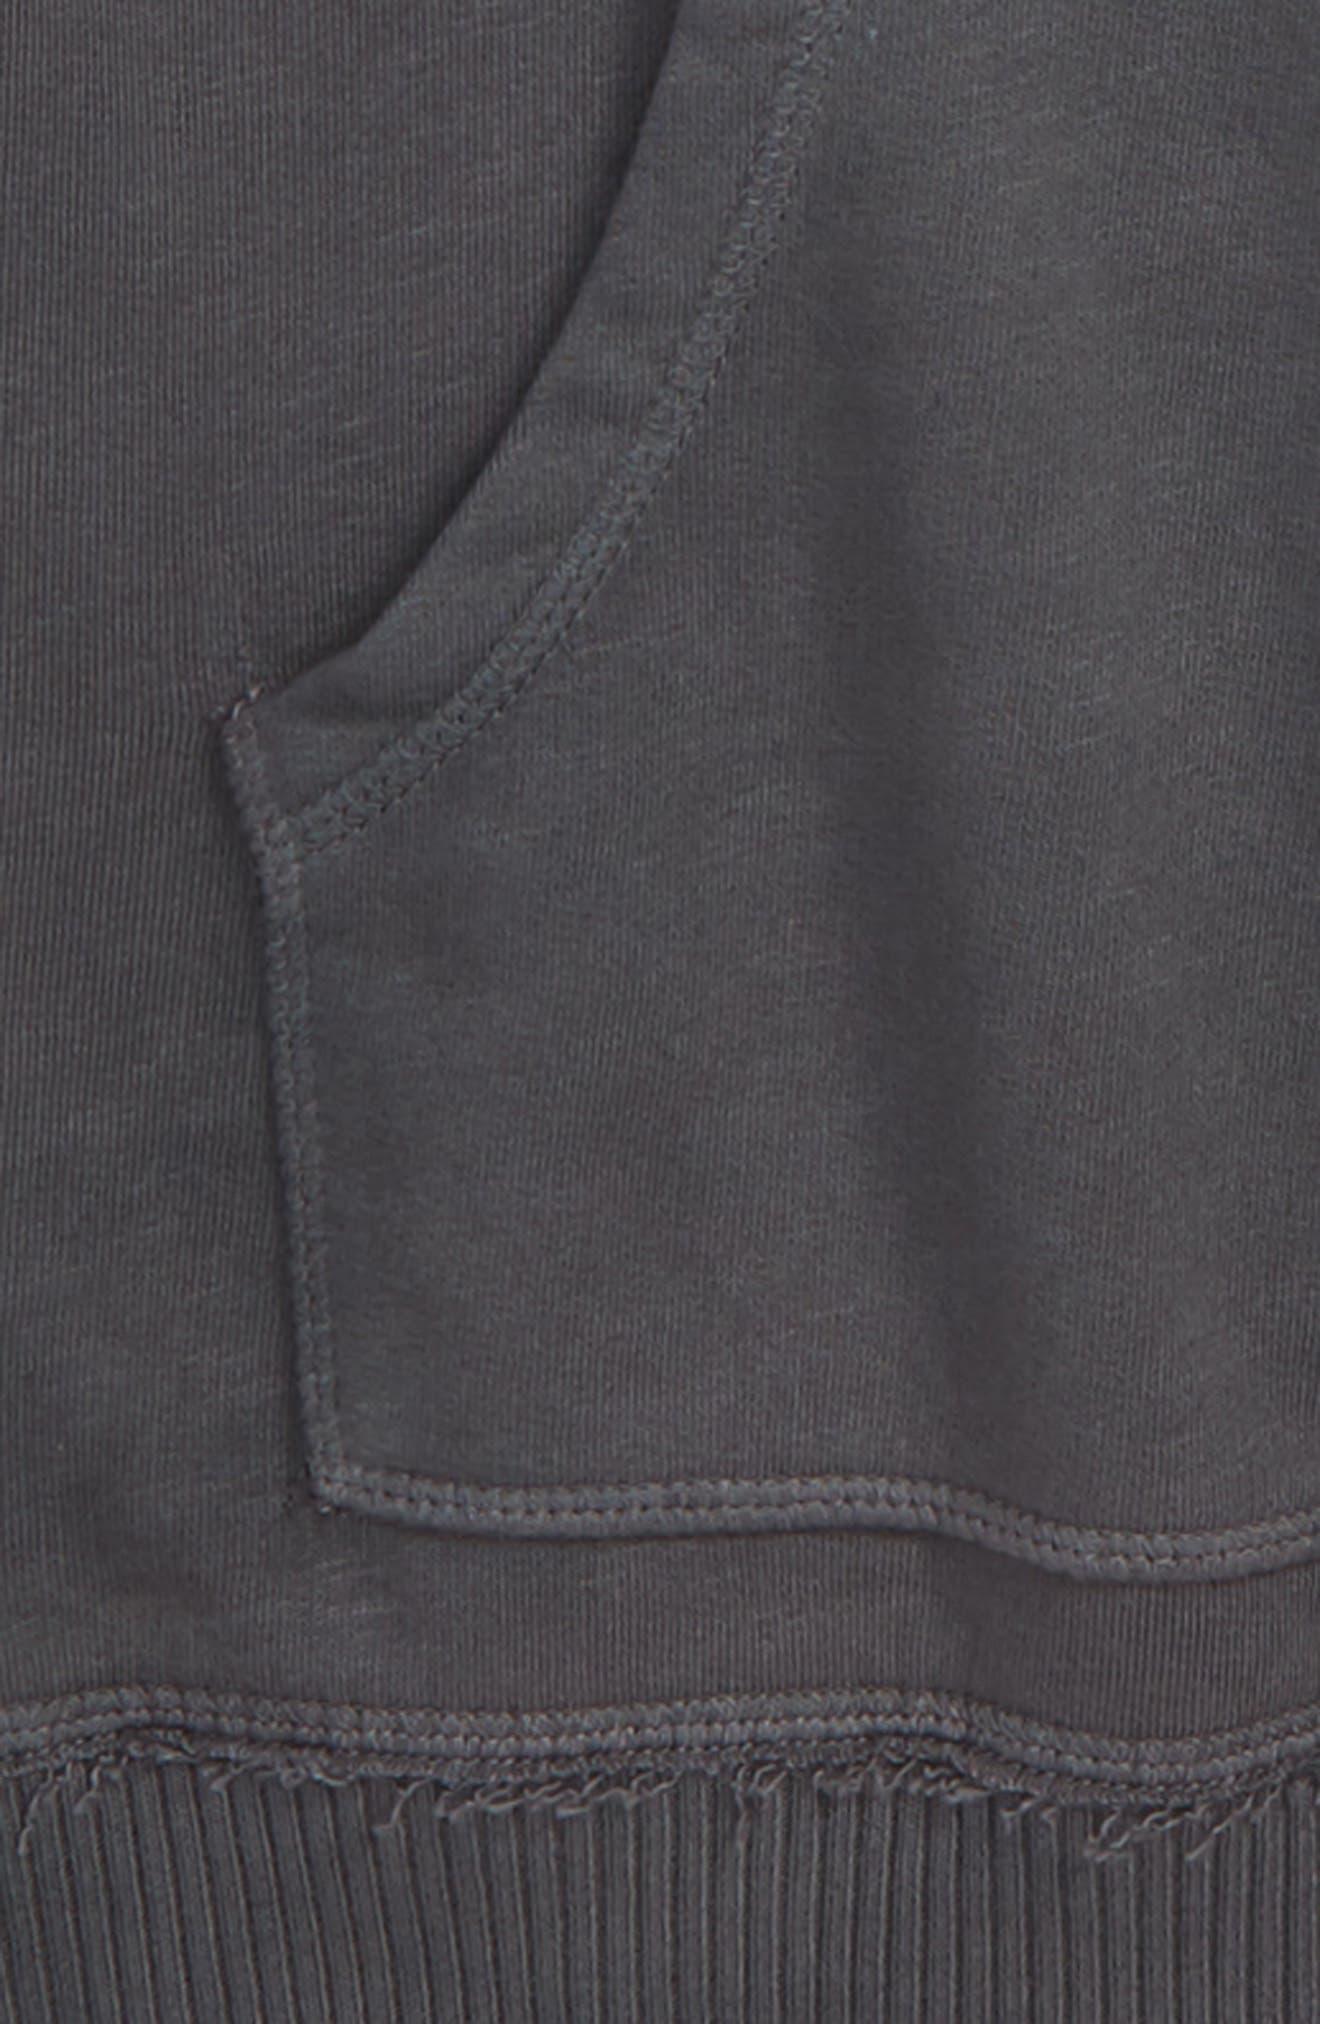 Hooded Sweatshirt,                             Alternate thumbnail 2, color,                             GREY ONYX WASH